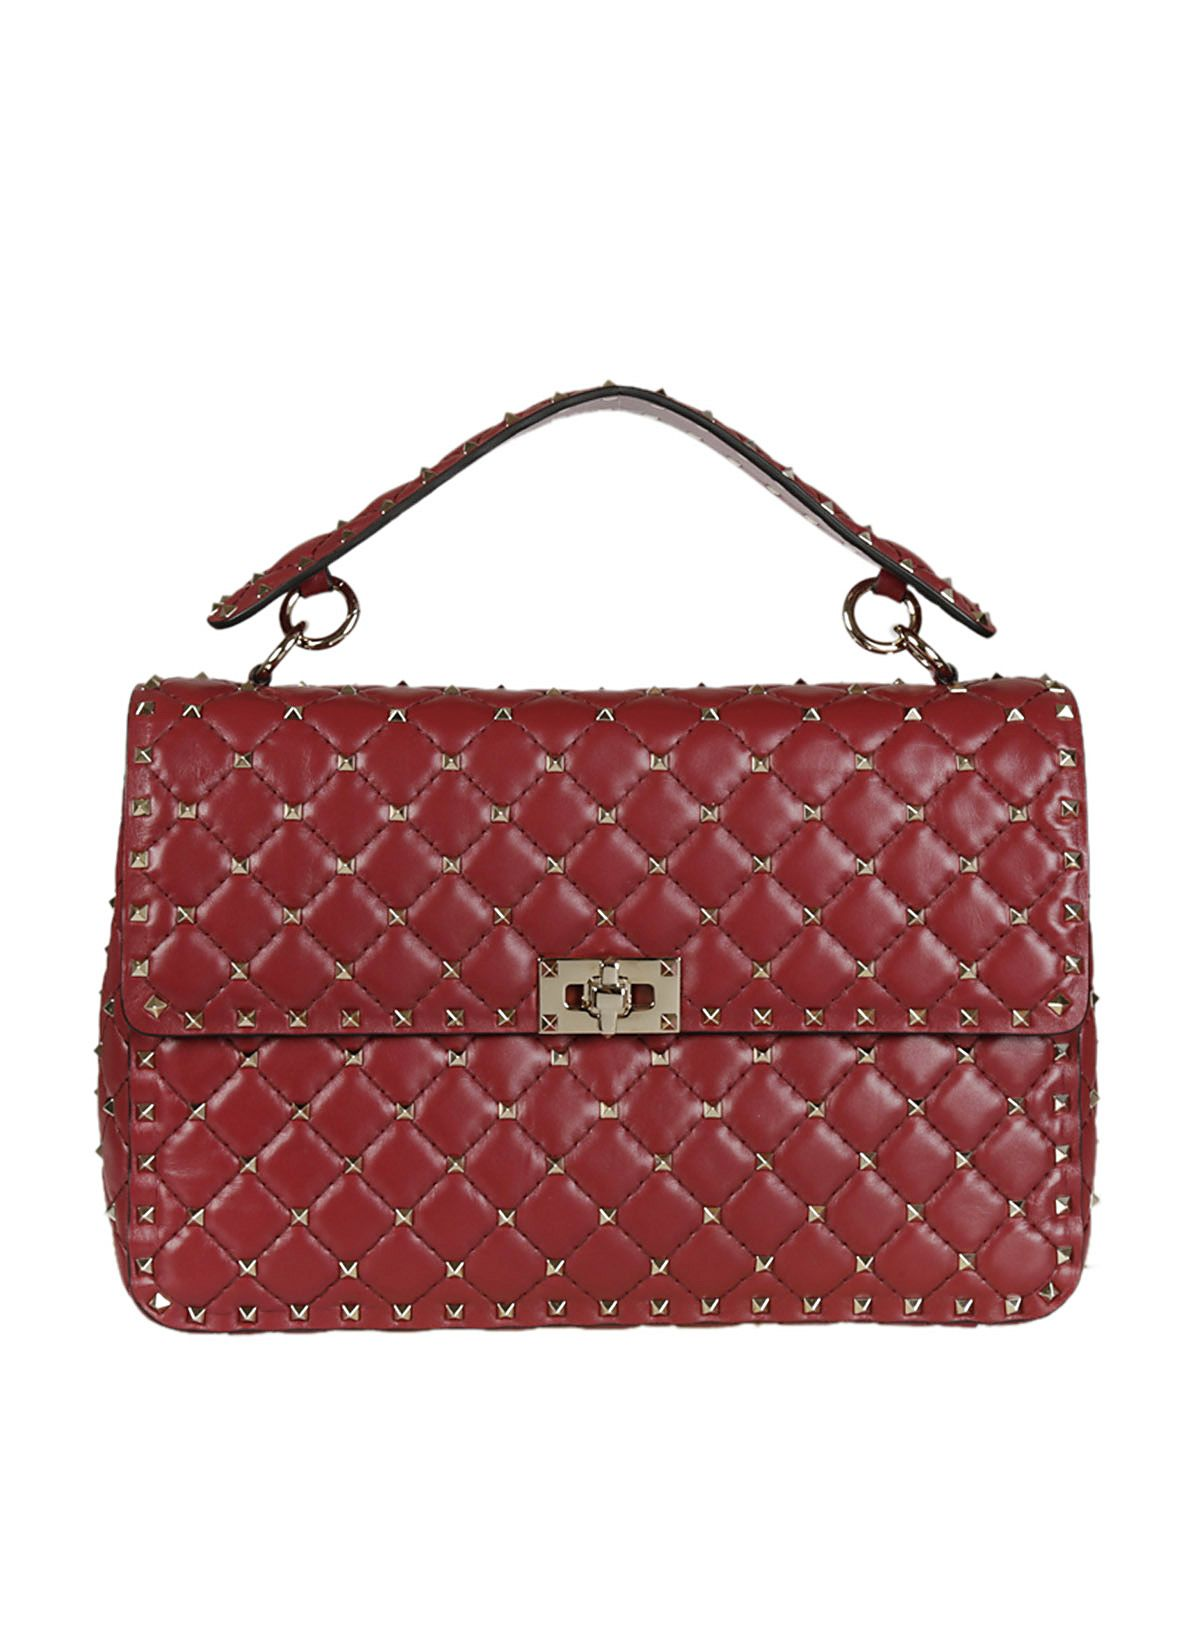 Valentino Valentino Garavani Rockstud Spike Shoulder Bag